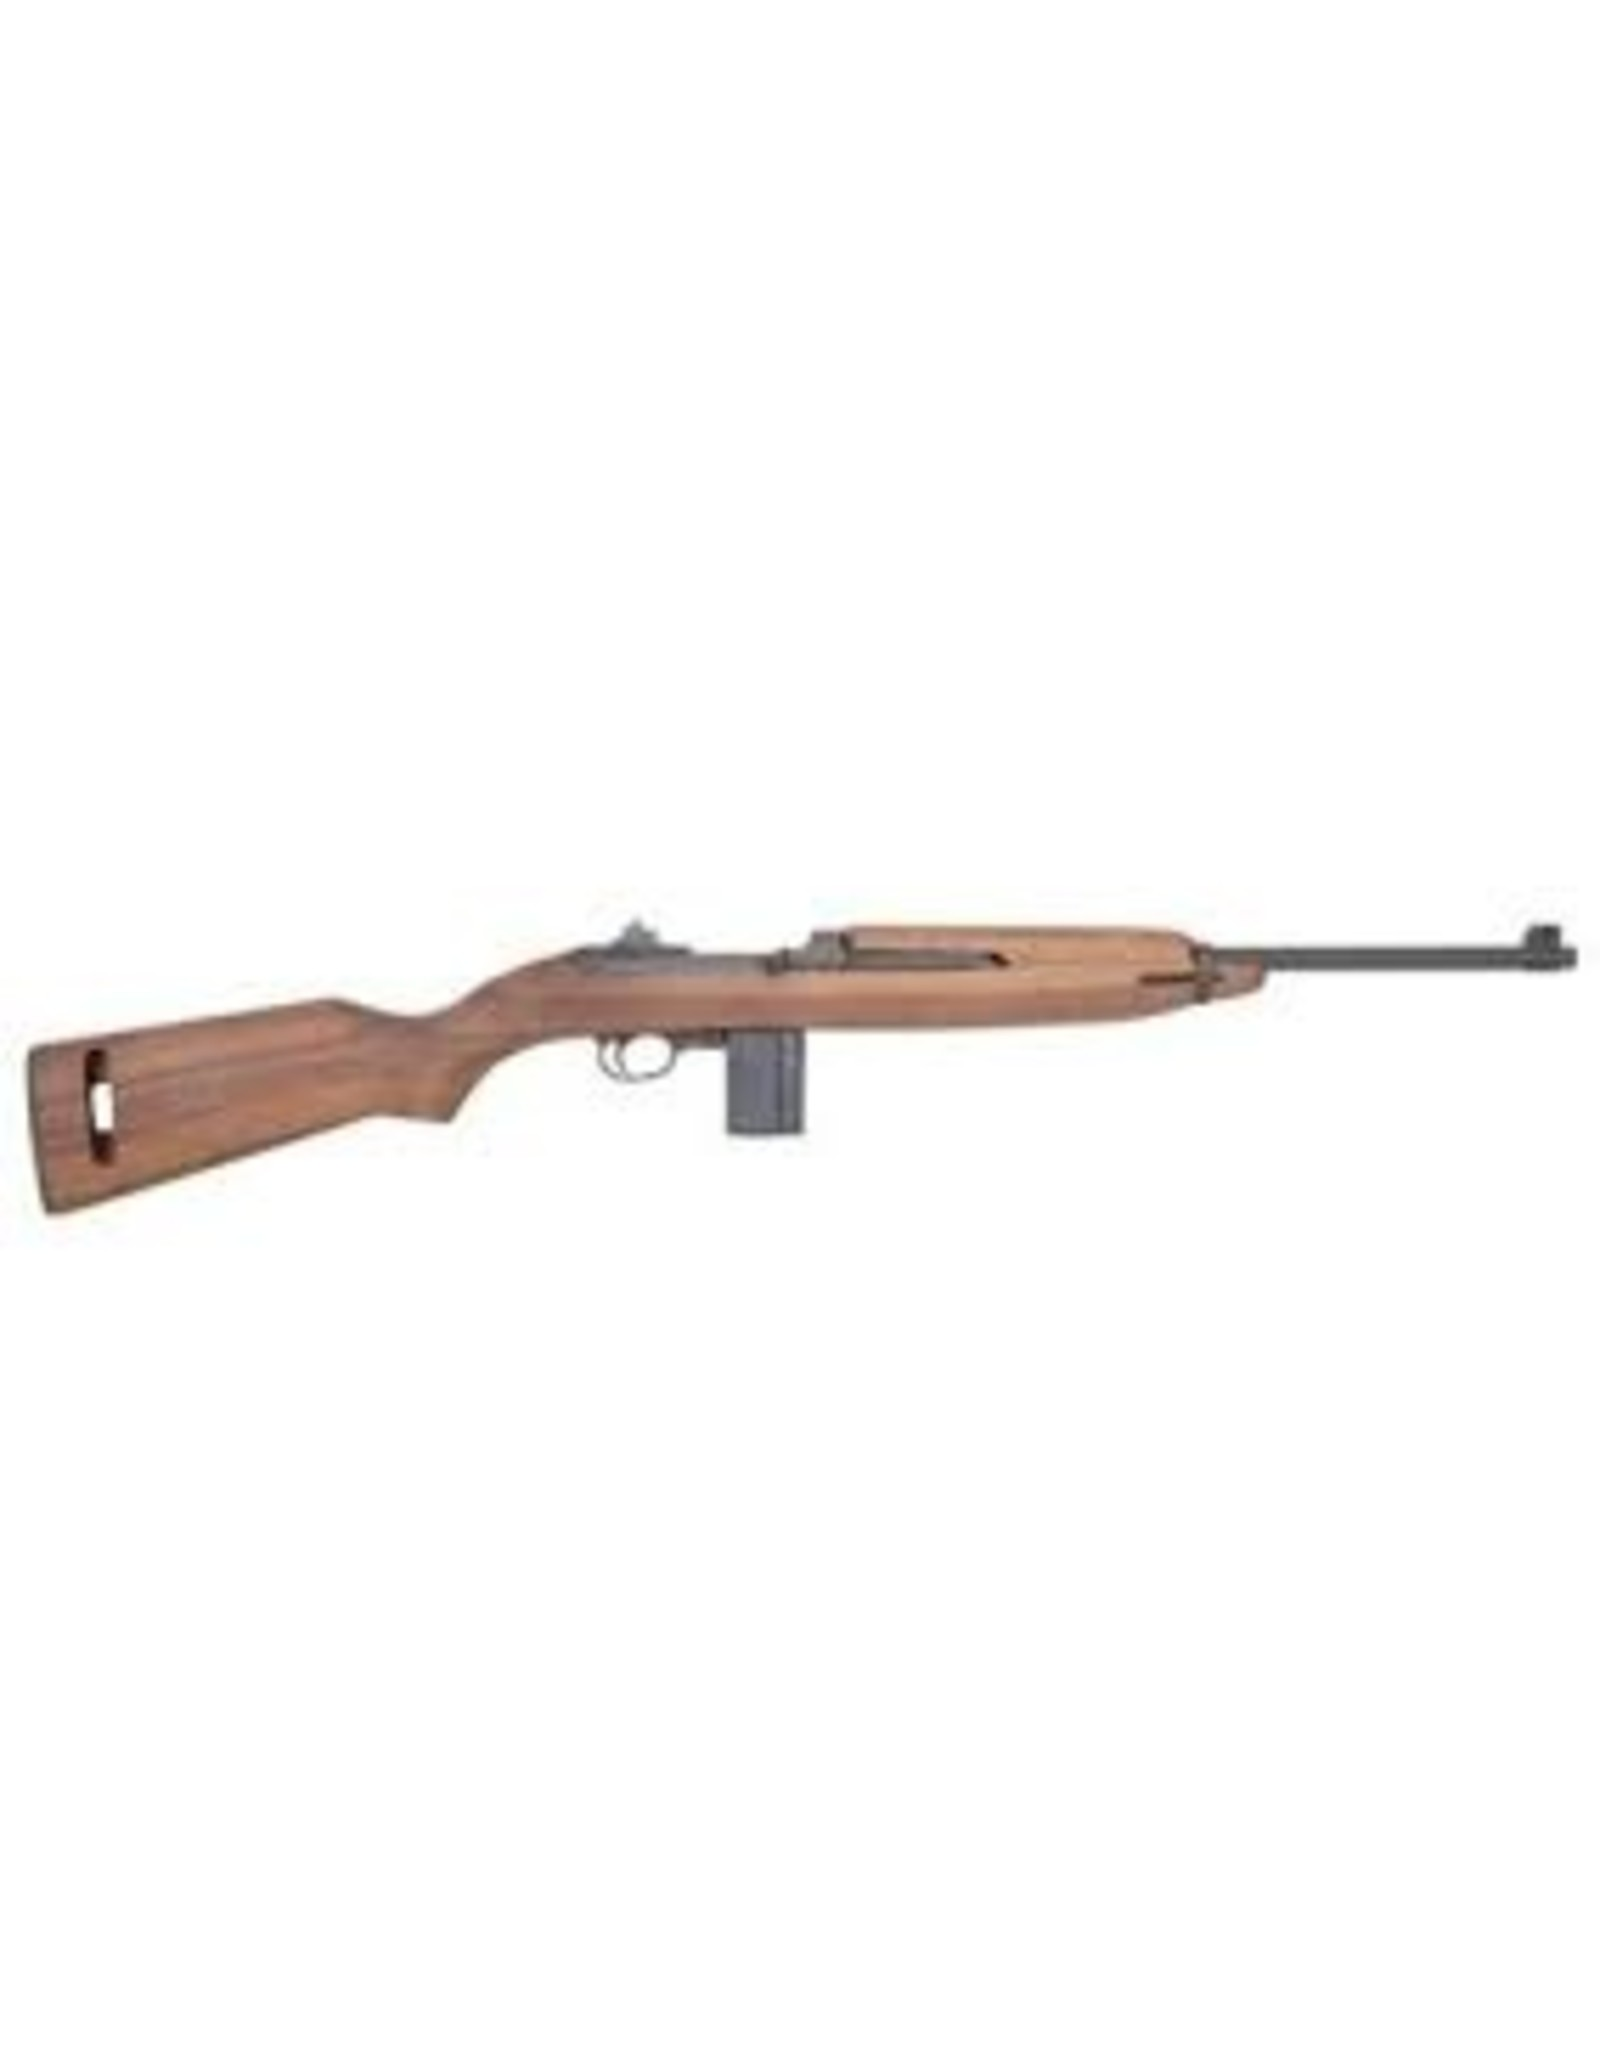 "Auto Ordnance M1 Carbine c.30 Rifle 18.6"" Barrel"